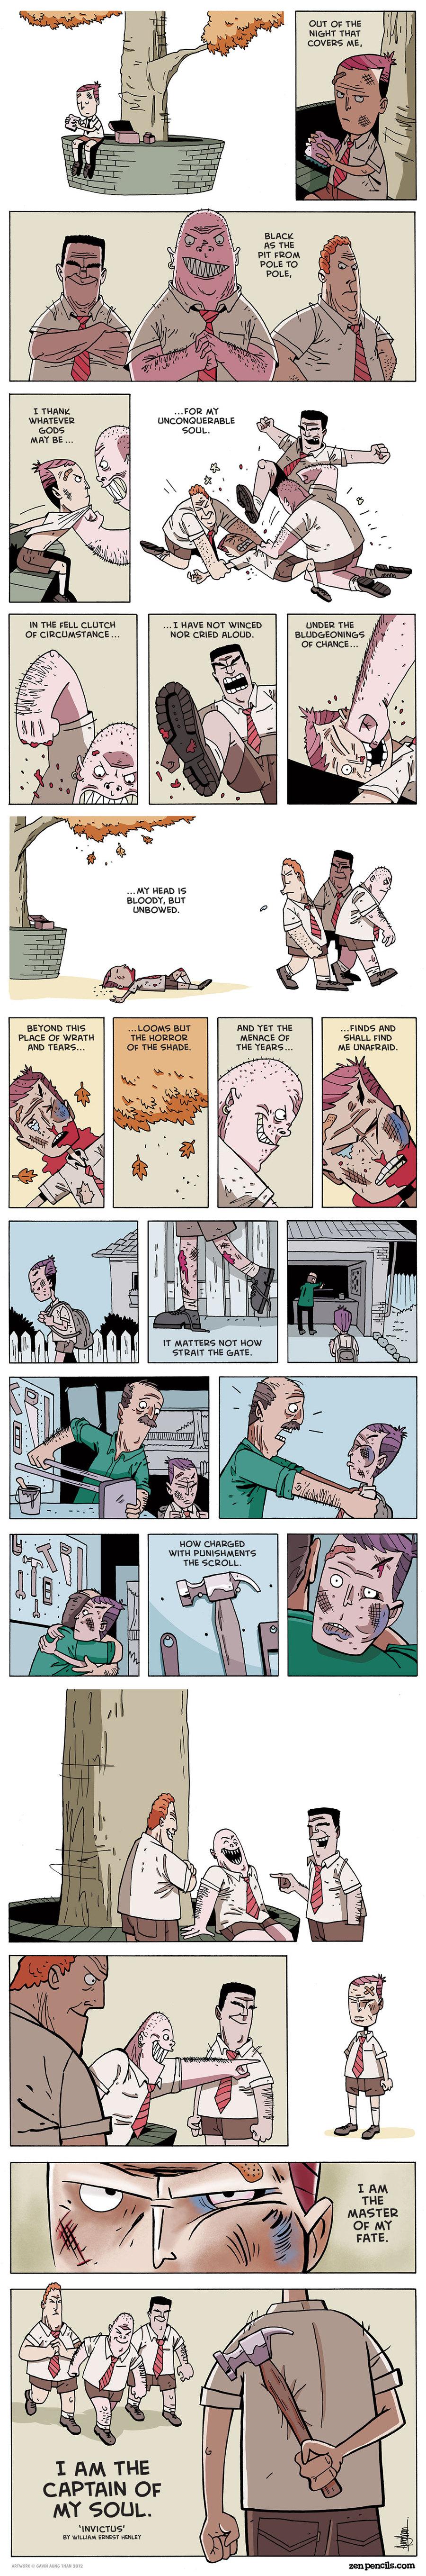 Zen Pencils for Aug 2, 2013 Comic Strip